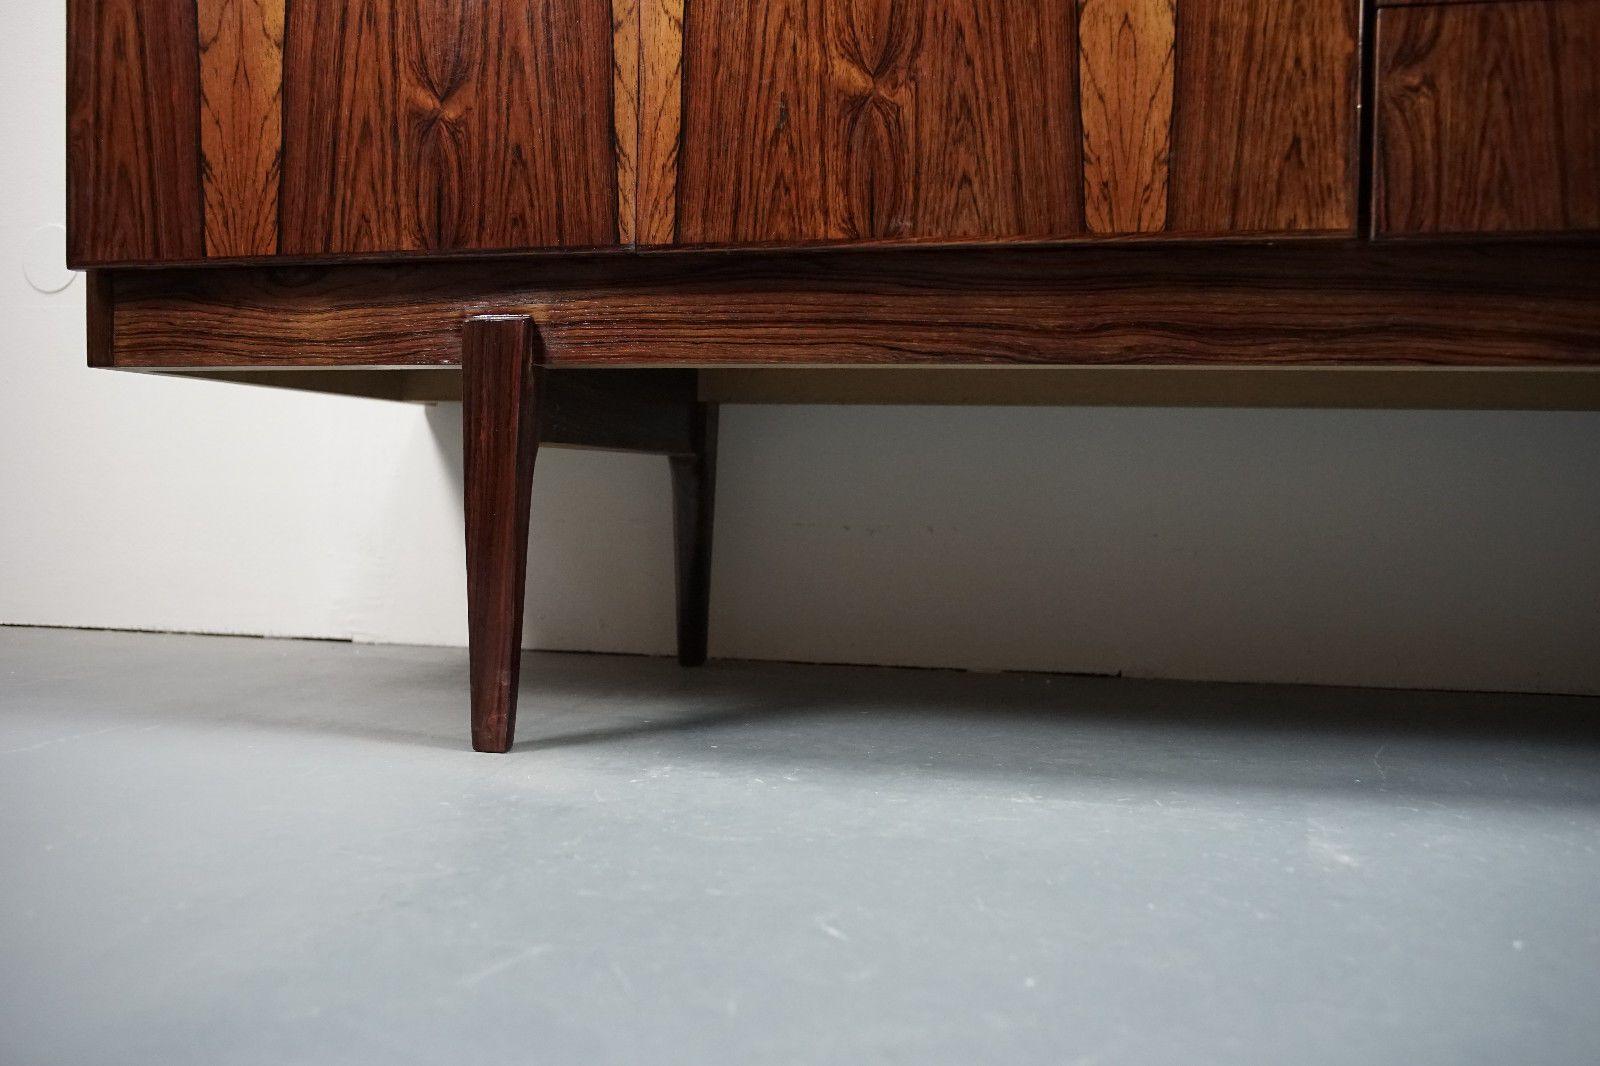 palisander sideboard from swissform 1960s for sale at pamono. Black Bedroom Furniture Sets. Home Design Ideas